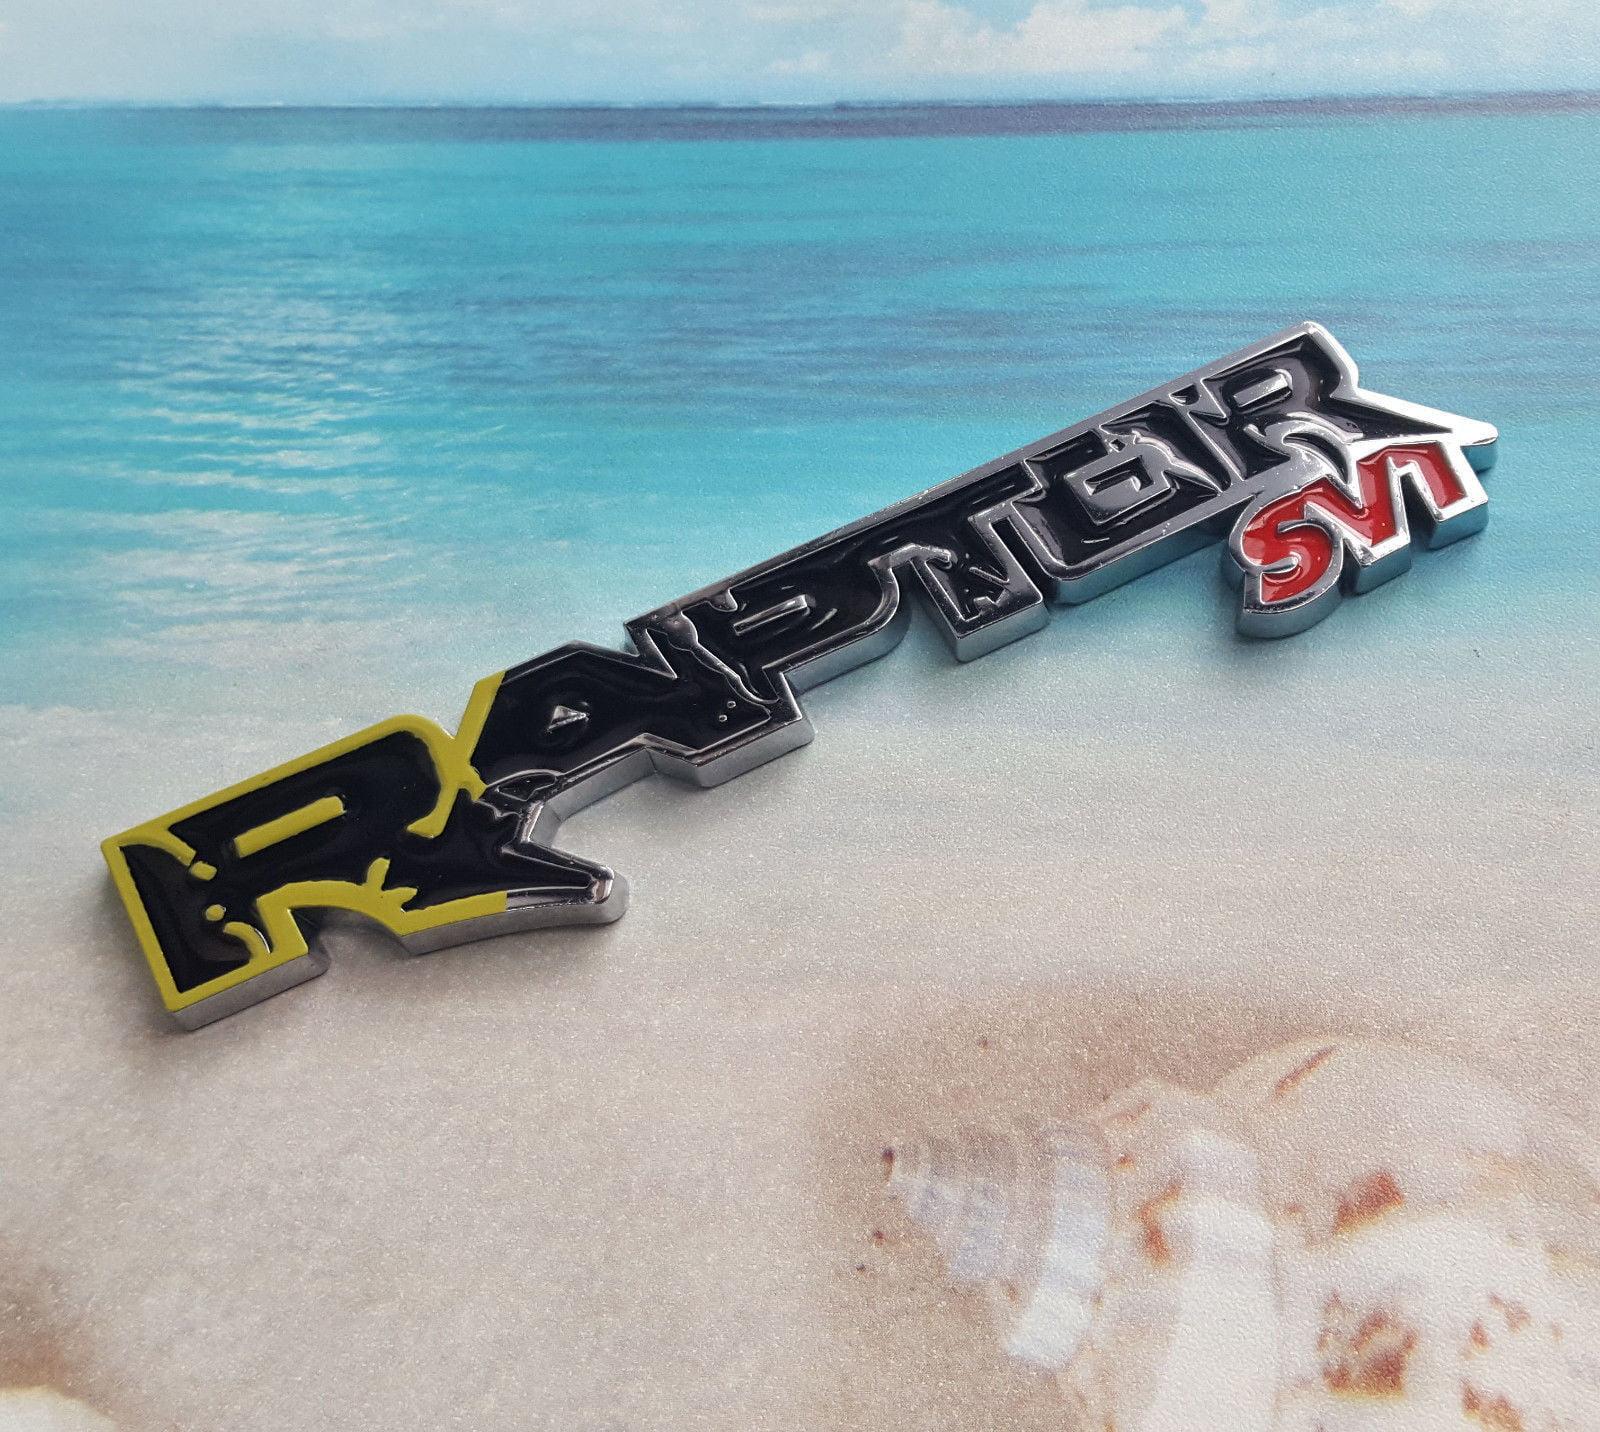 Metal Black Silver Raptor Svt Emblem Badge Decal Sticker Ford F150 Ranger T6 Walmart Com Walmart Com